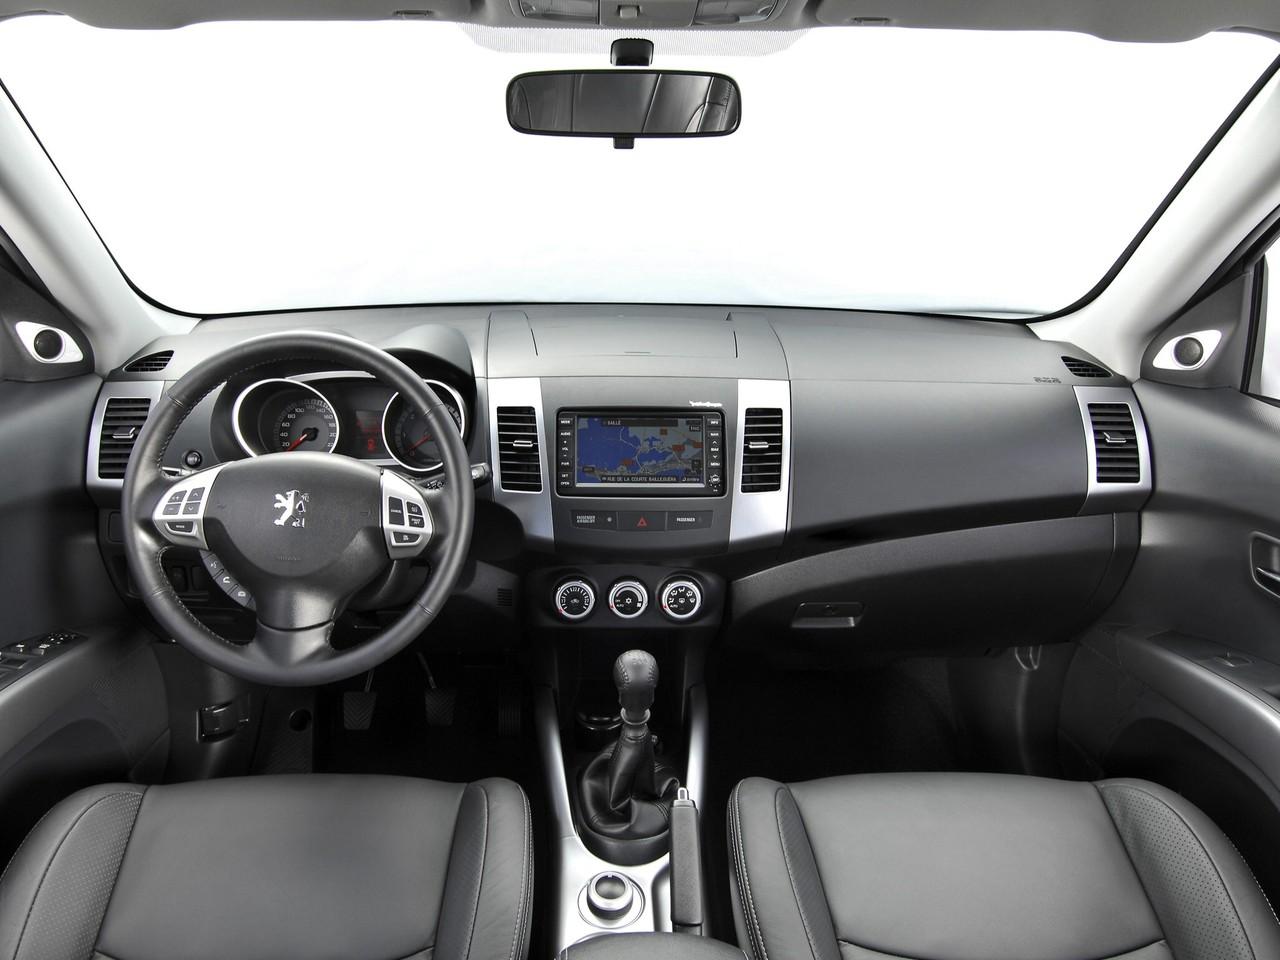 Peugeot 4007 7999euro 2008